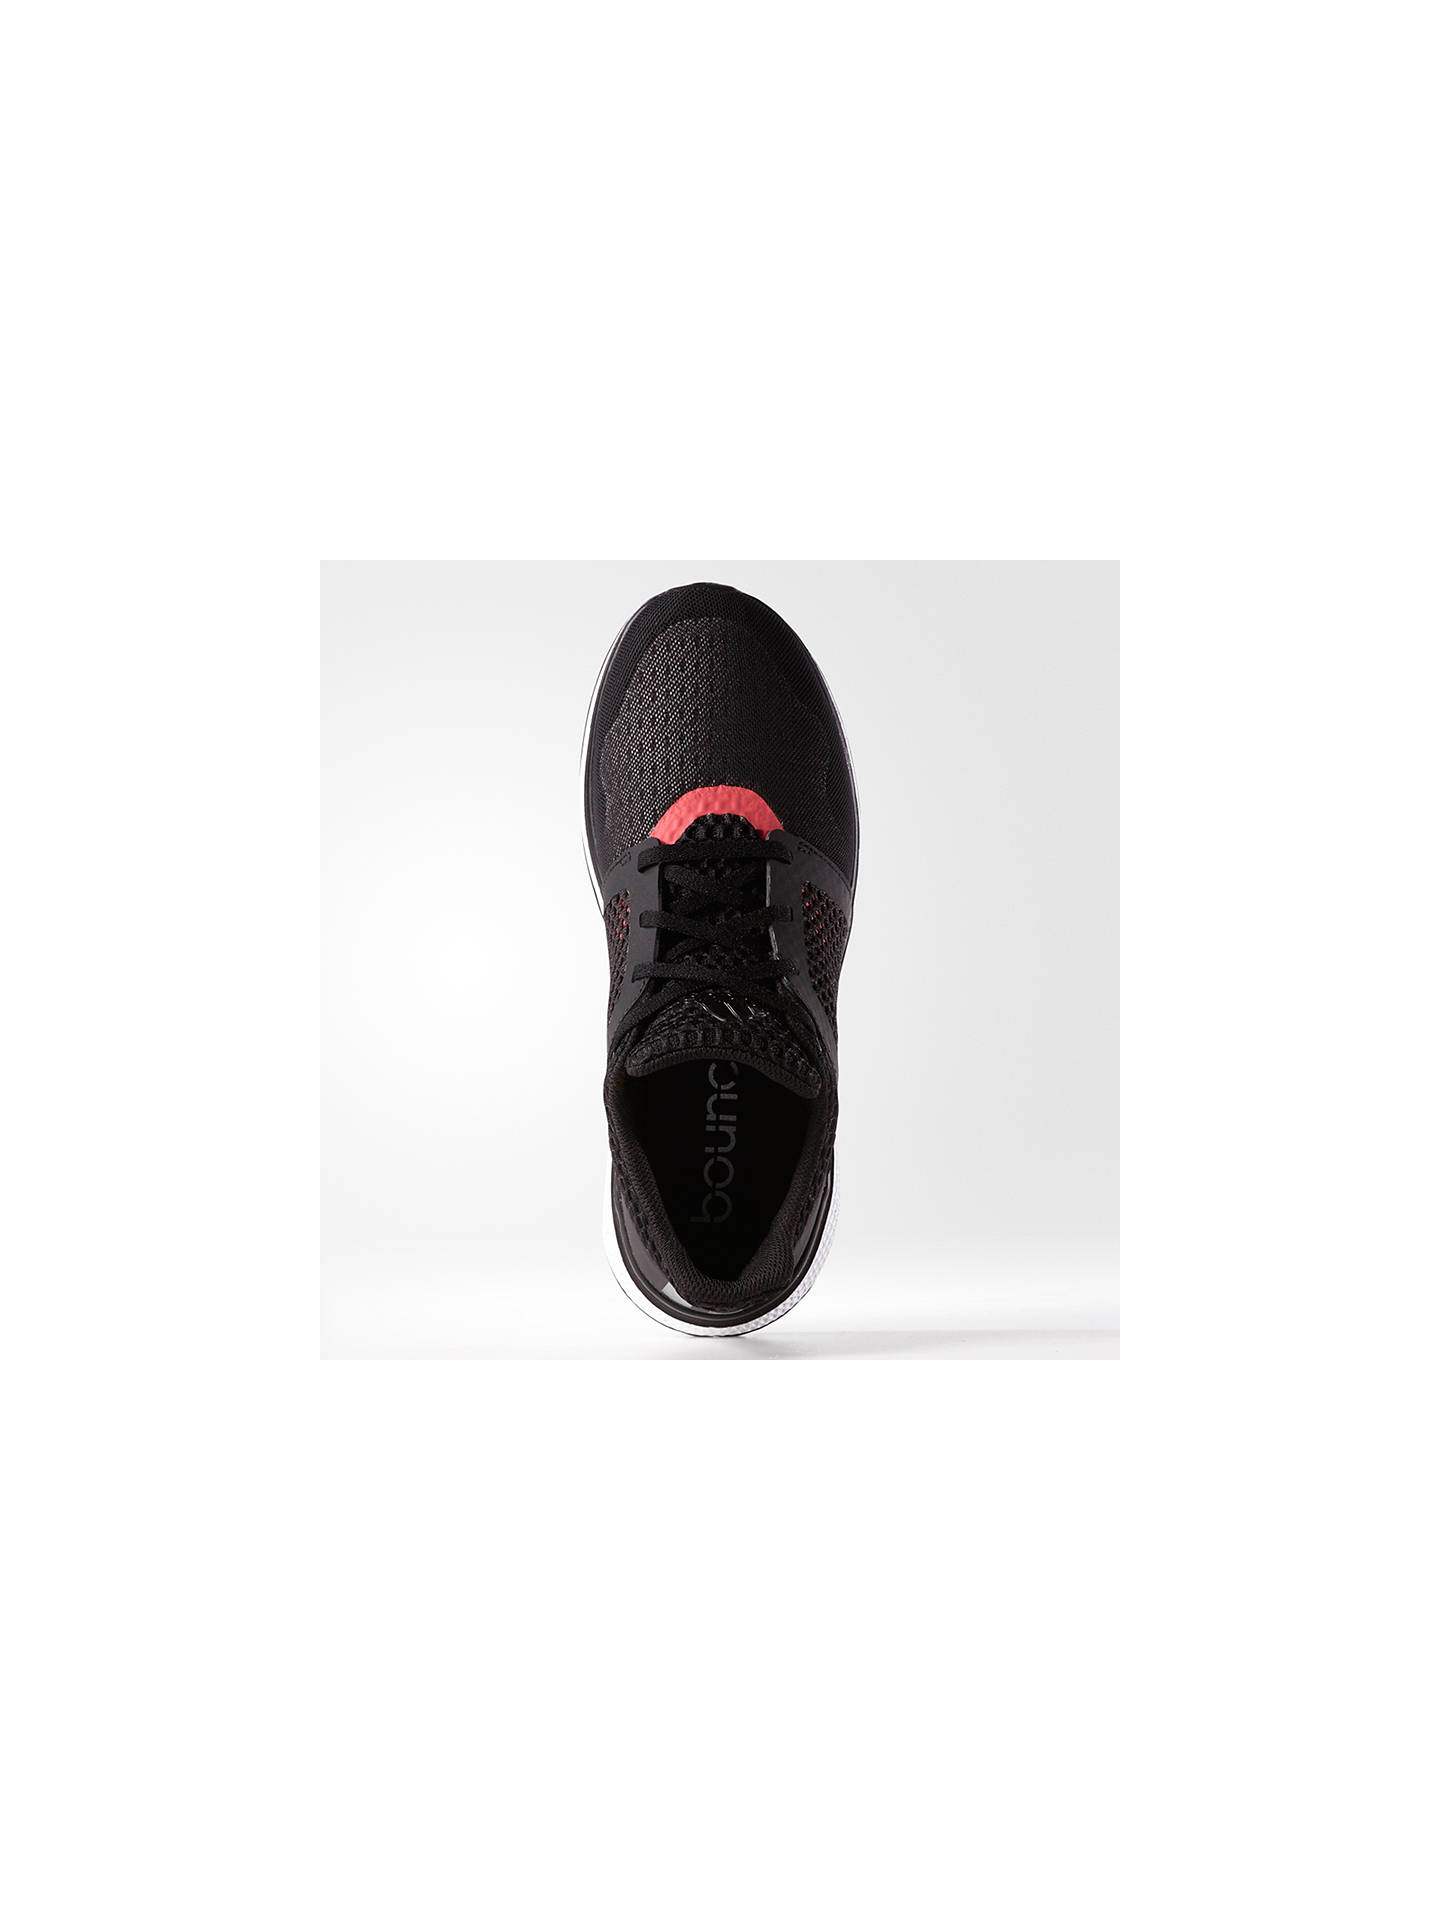 66aa5a021 ... Buy Adidas Energy Bounce 2.0 Women s Running Shoes